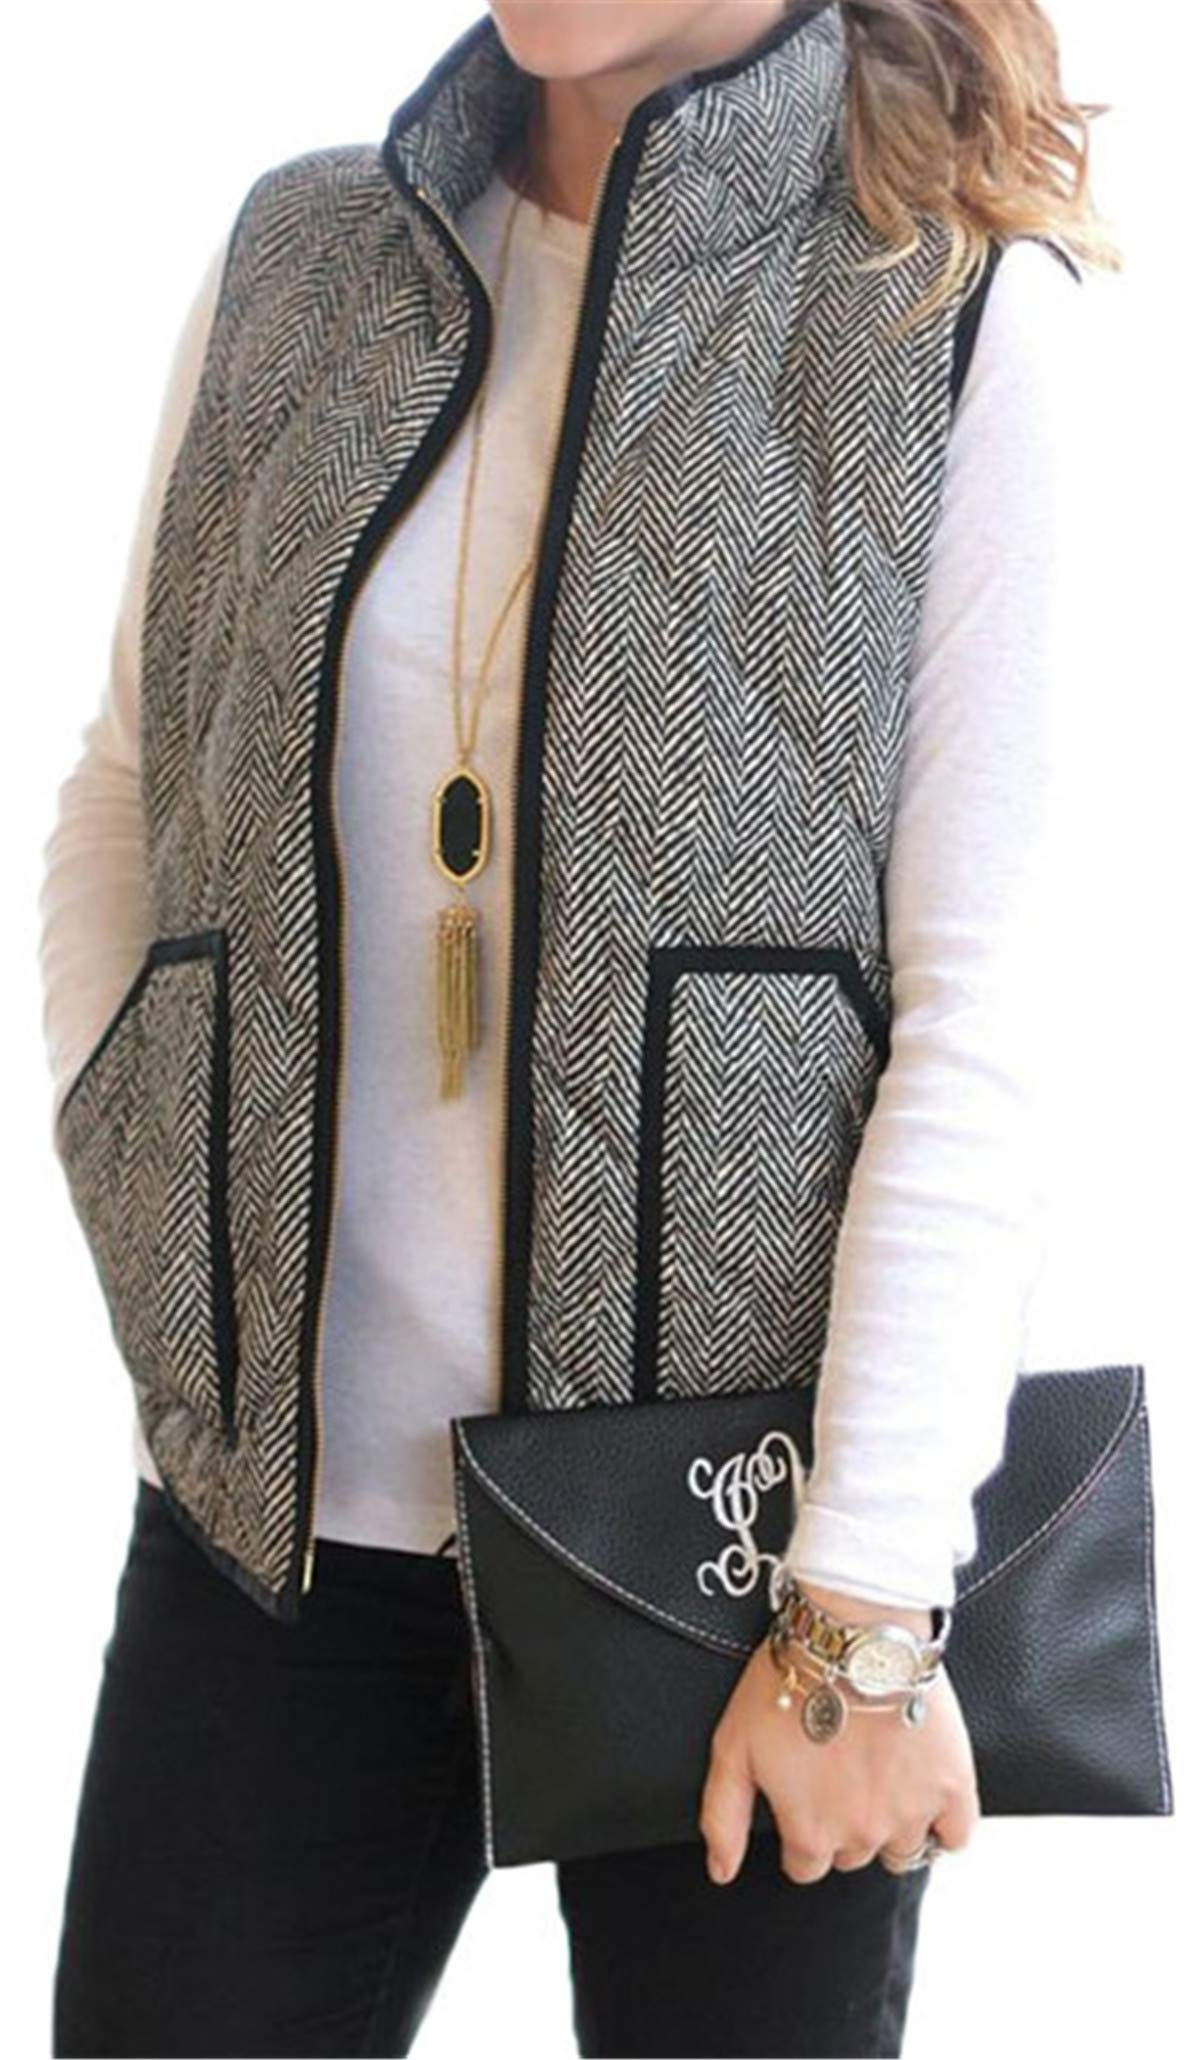 onlypuff Black Vest Women Herringbone Pattern Sleeveless Casual Fall Outwear Vests XXL by onlypuff